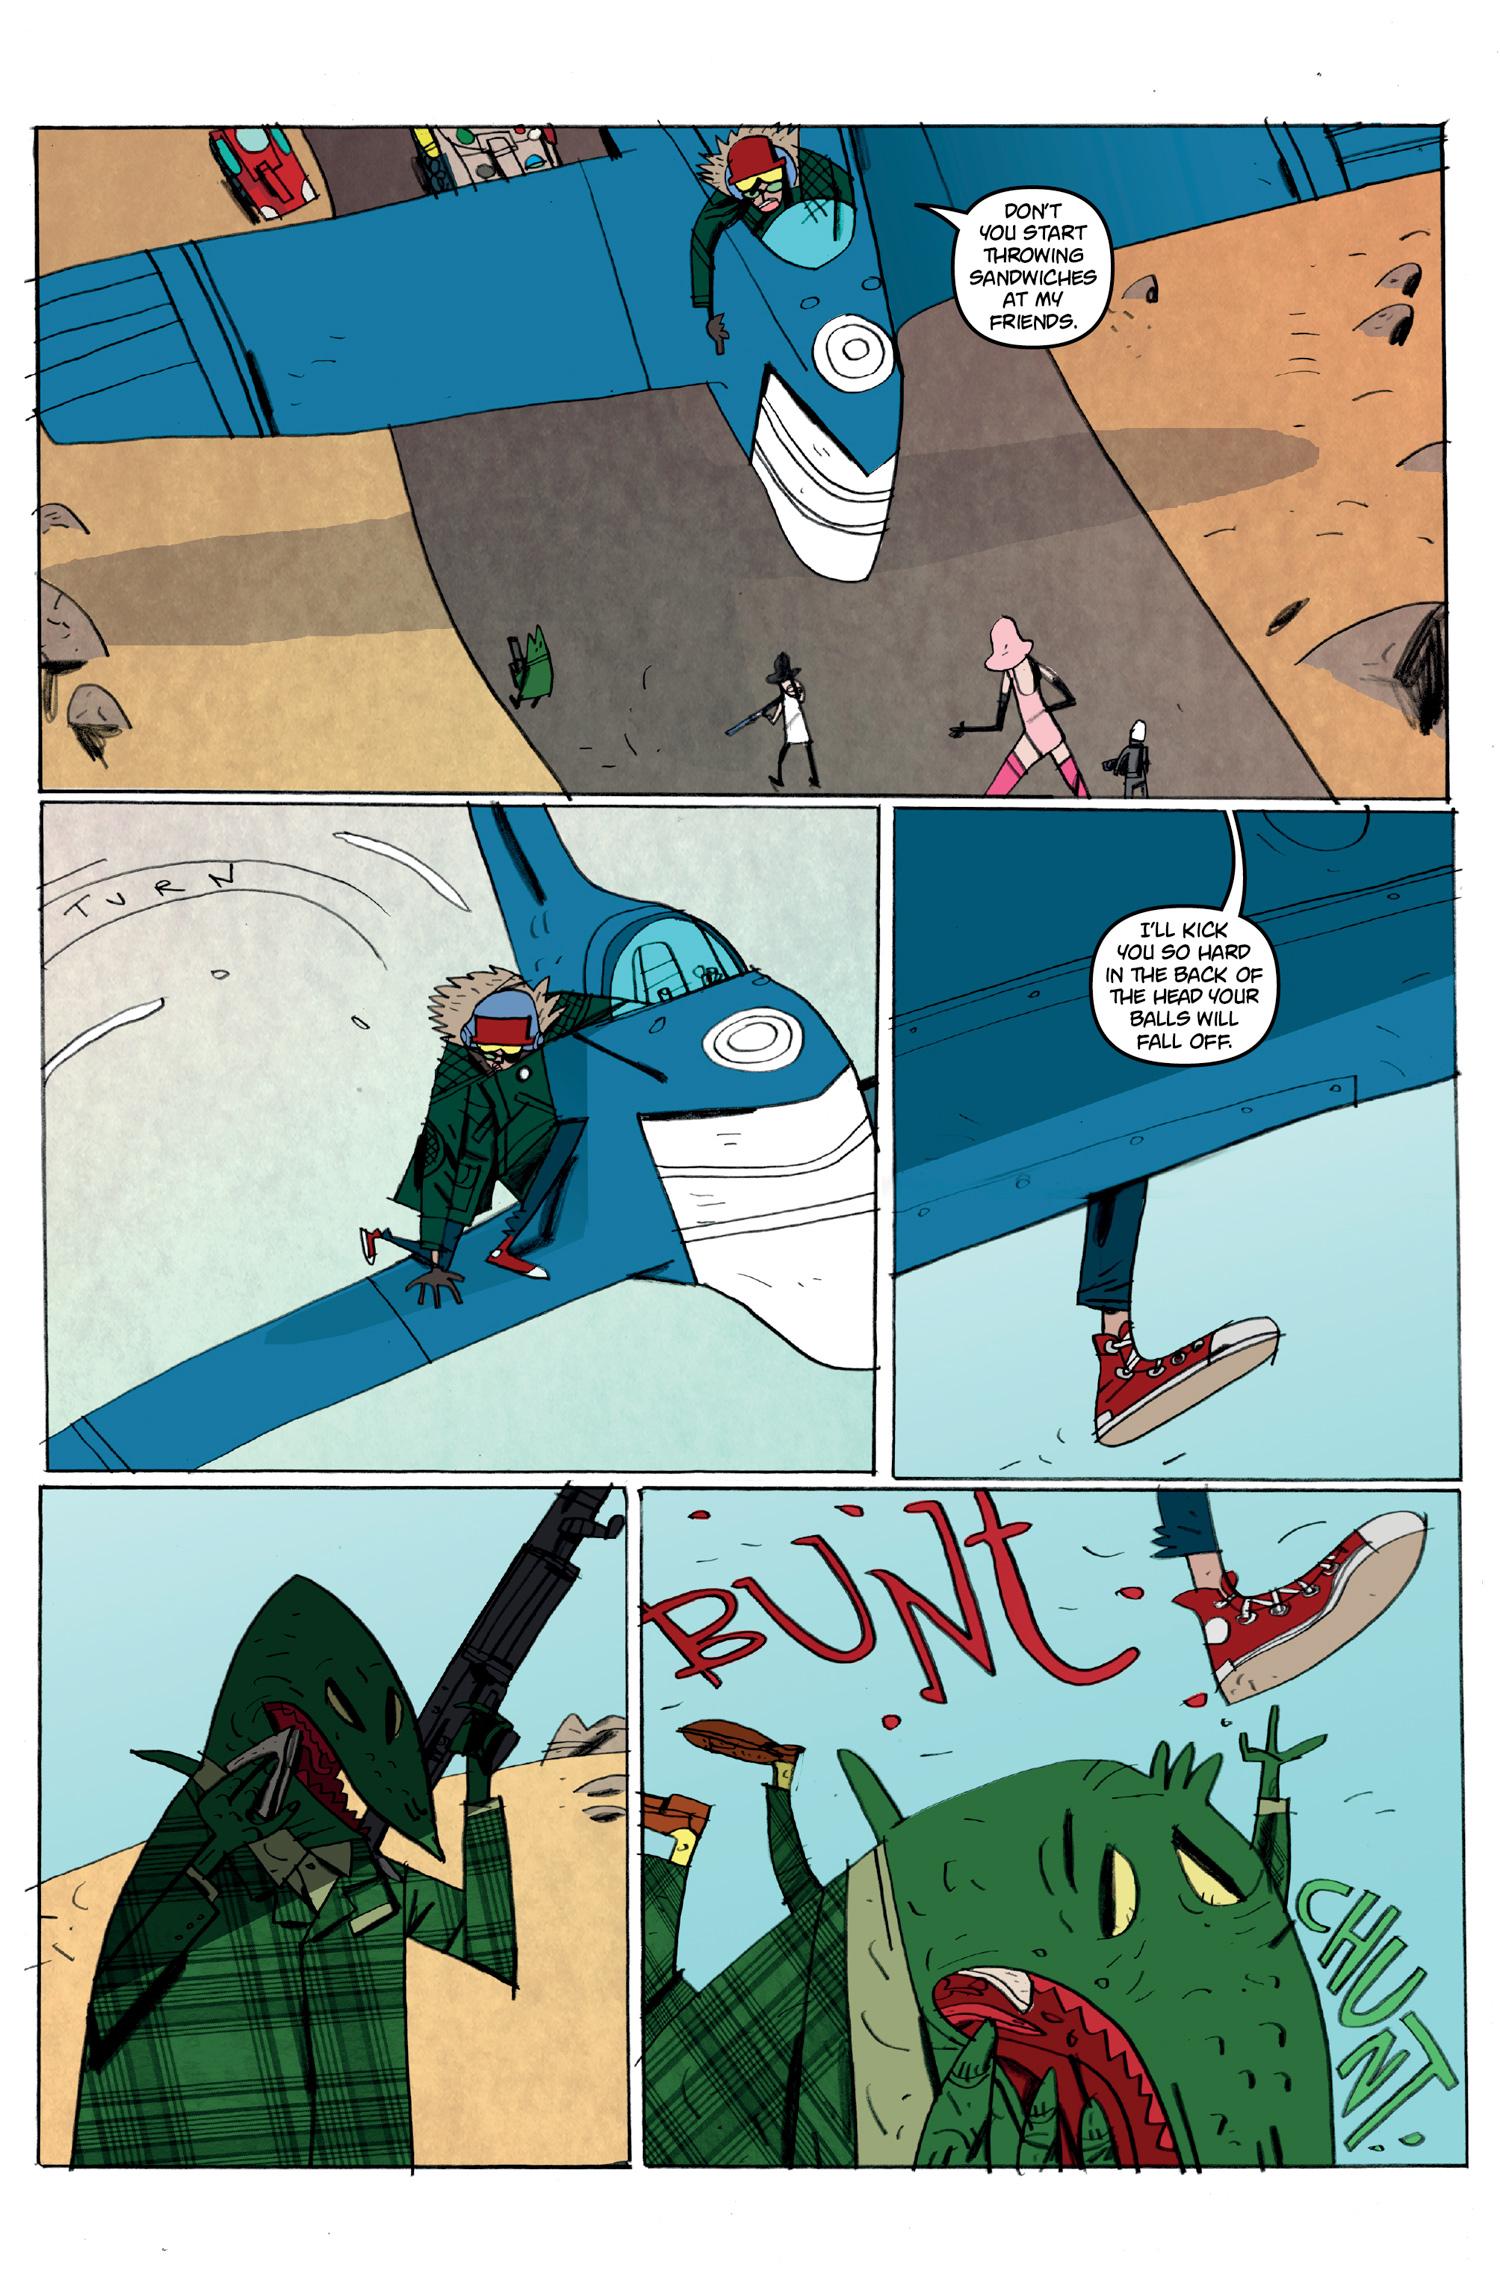 Archie comics archie comics sneak peek of the week major spoilers - Via Titan Comics